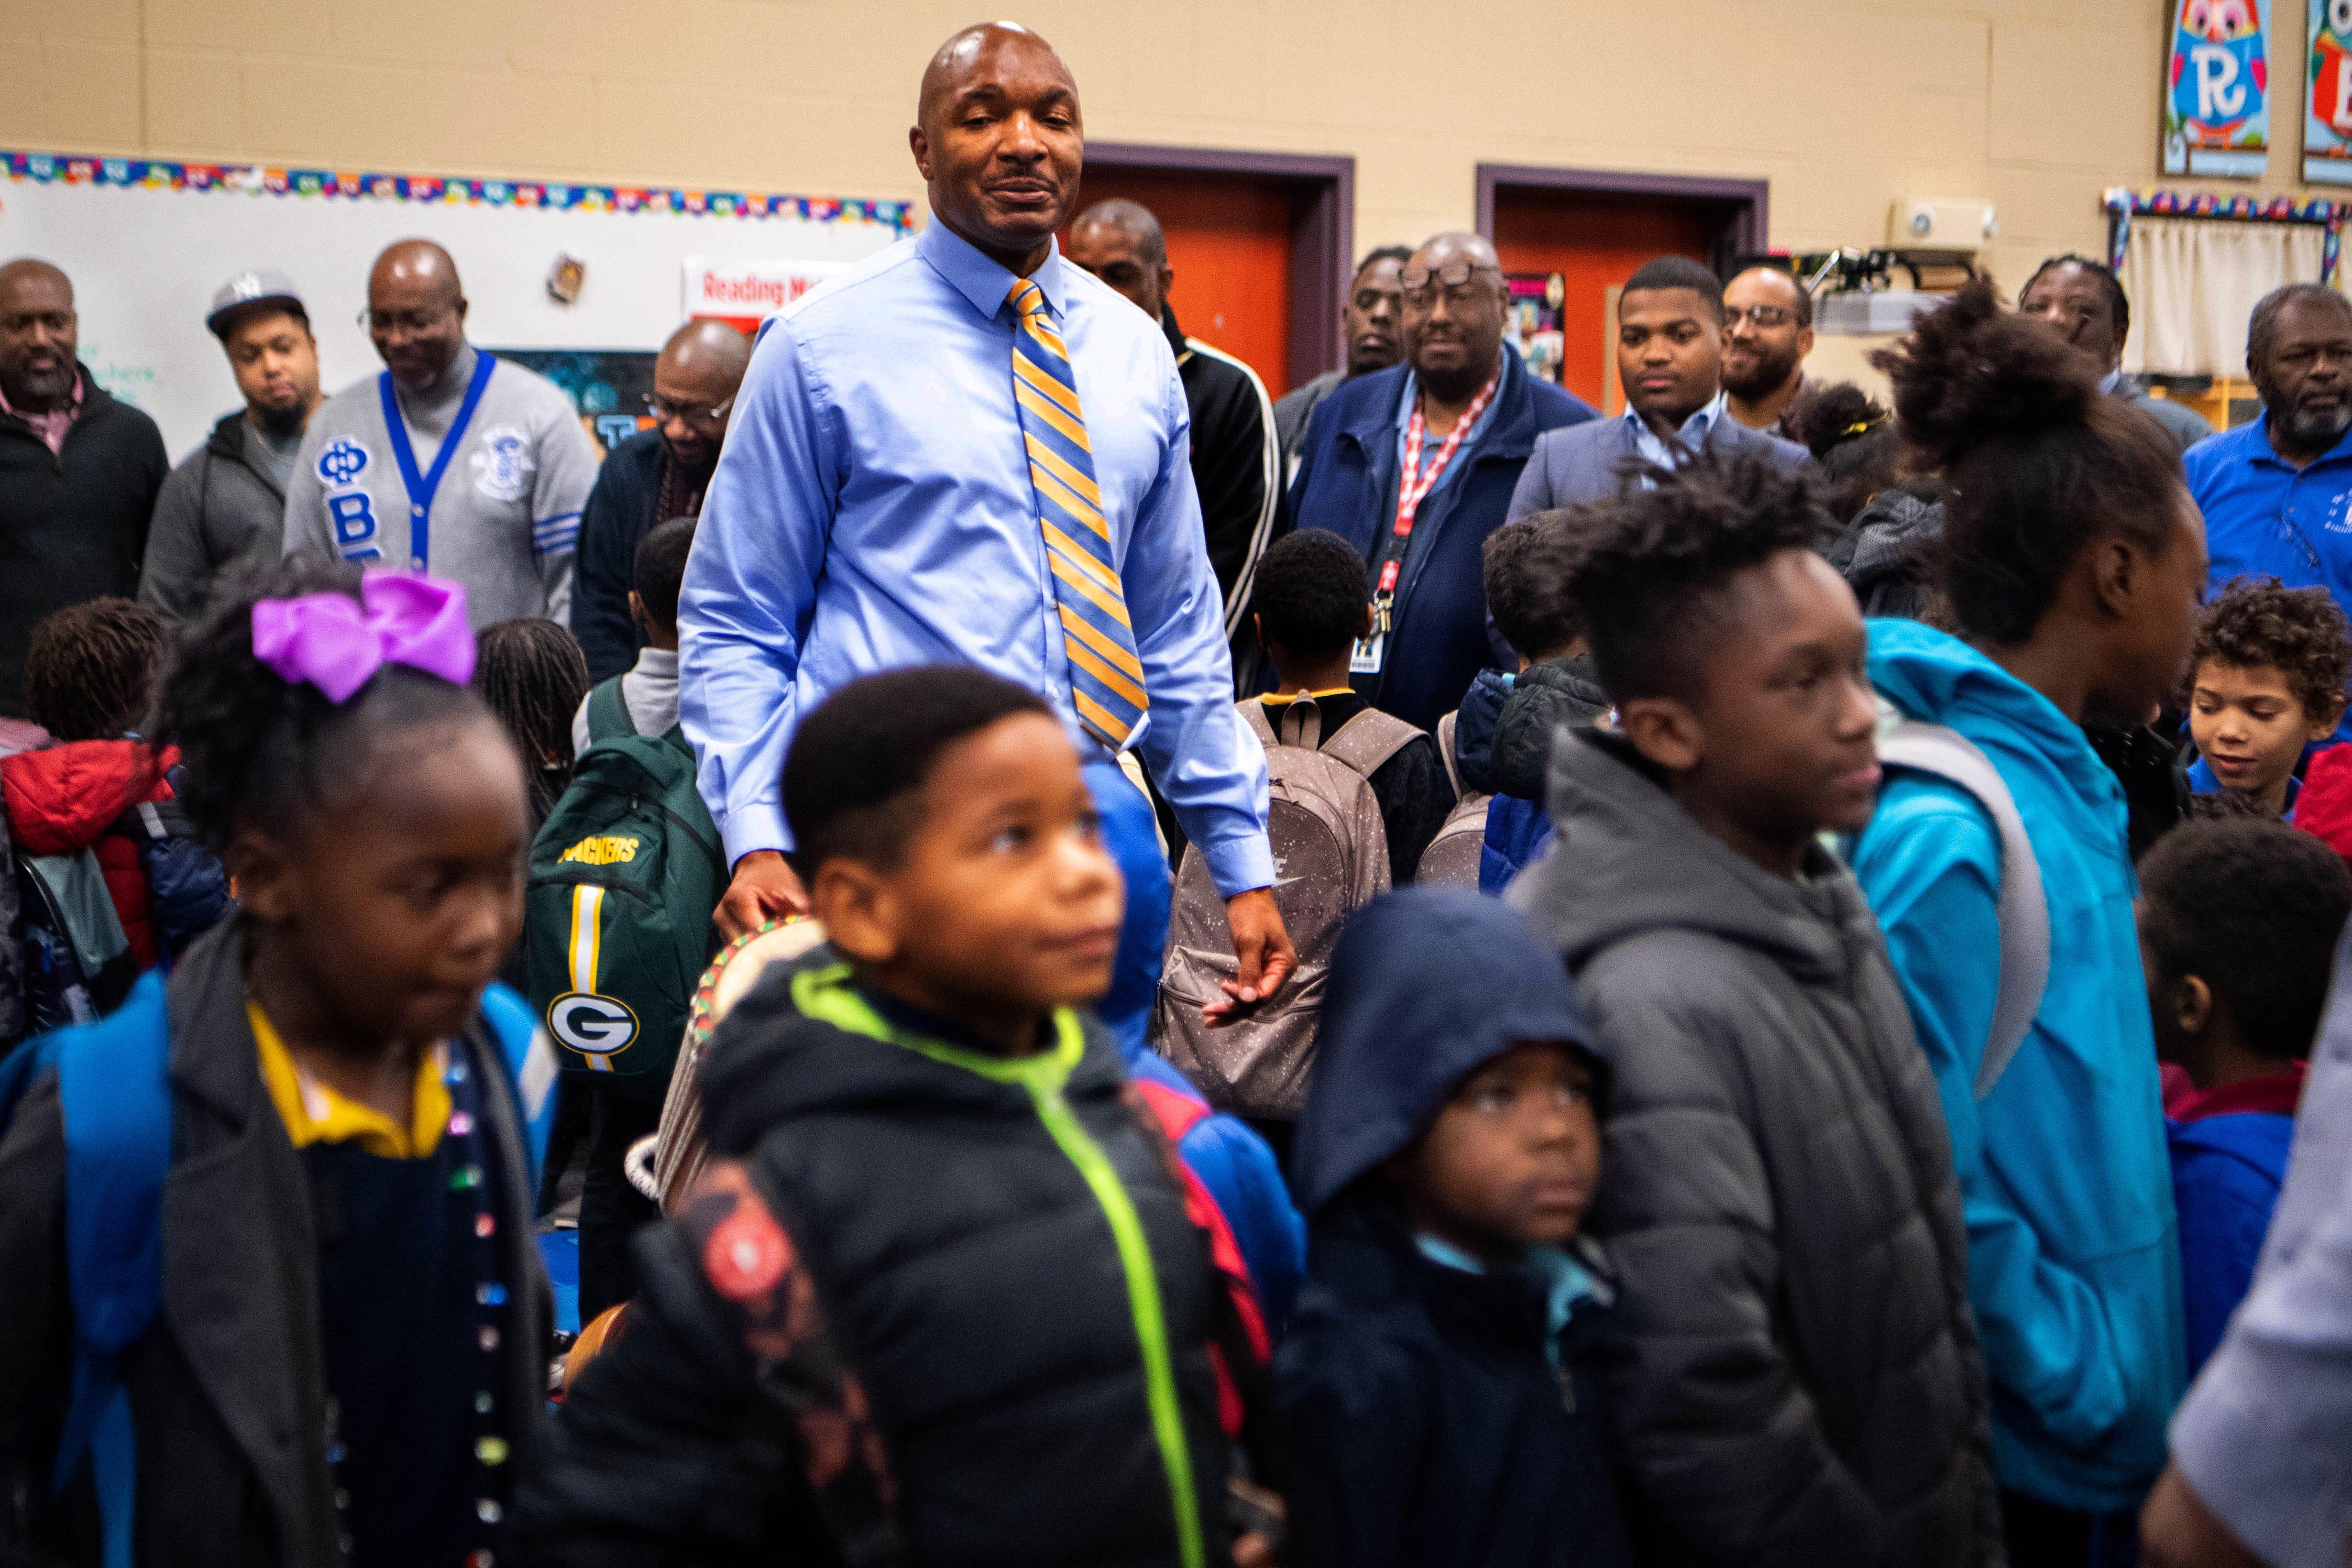 Educator Michael Pratt leads the Fatherhood Fridays group at Buena Vista Elementary School in Nashville, Tennessee.